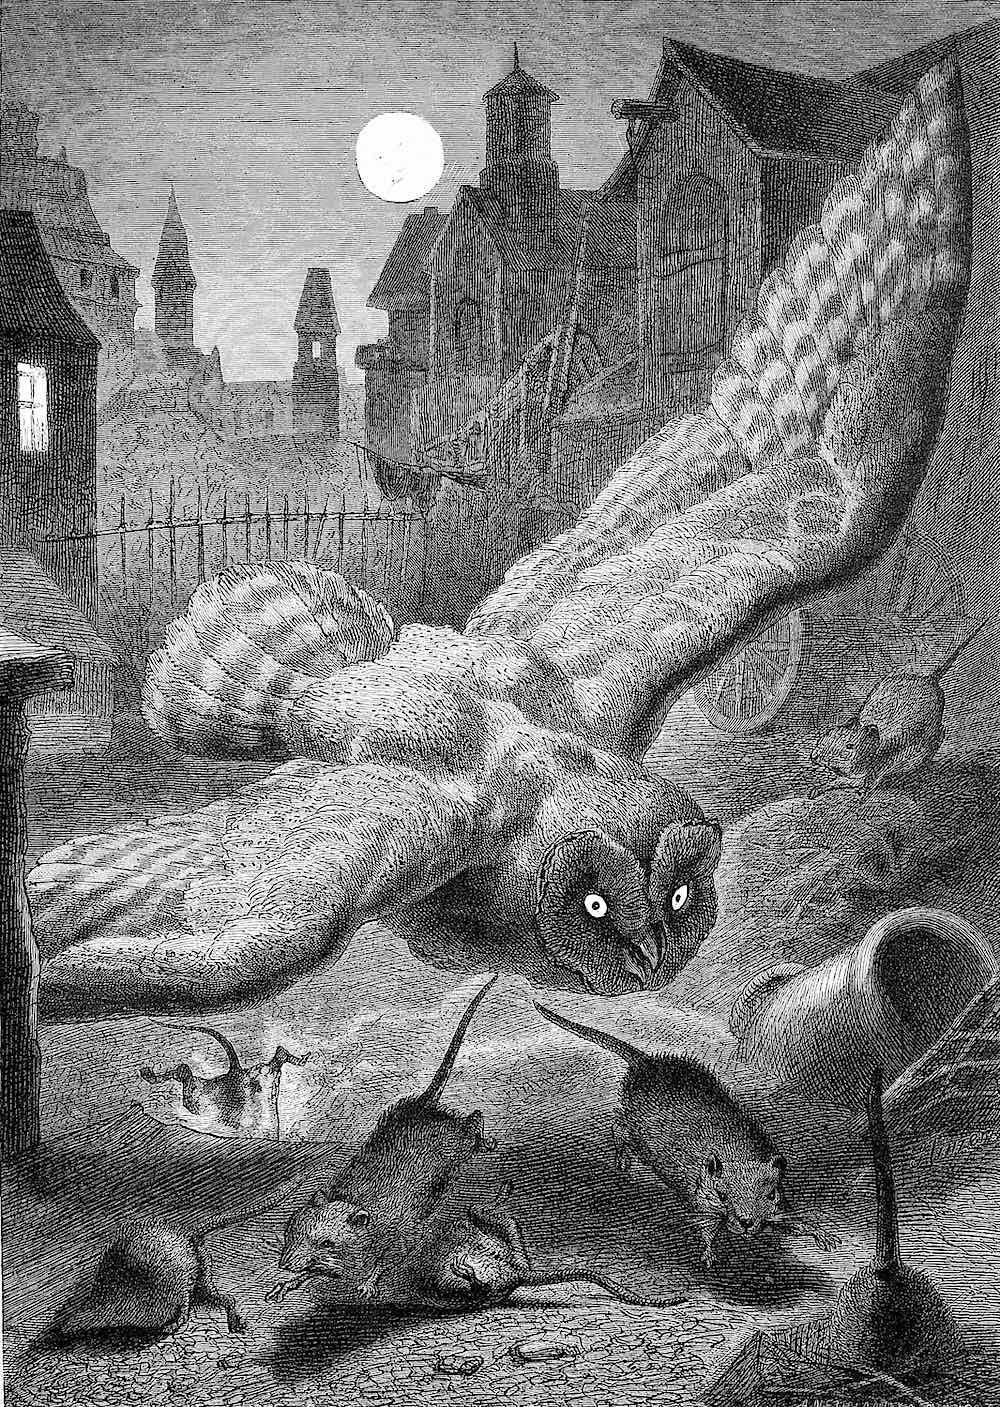 Fedor Flinzer 1879, an owl attacking mice